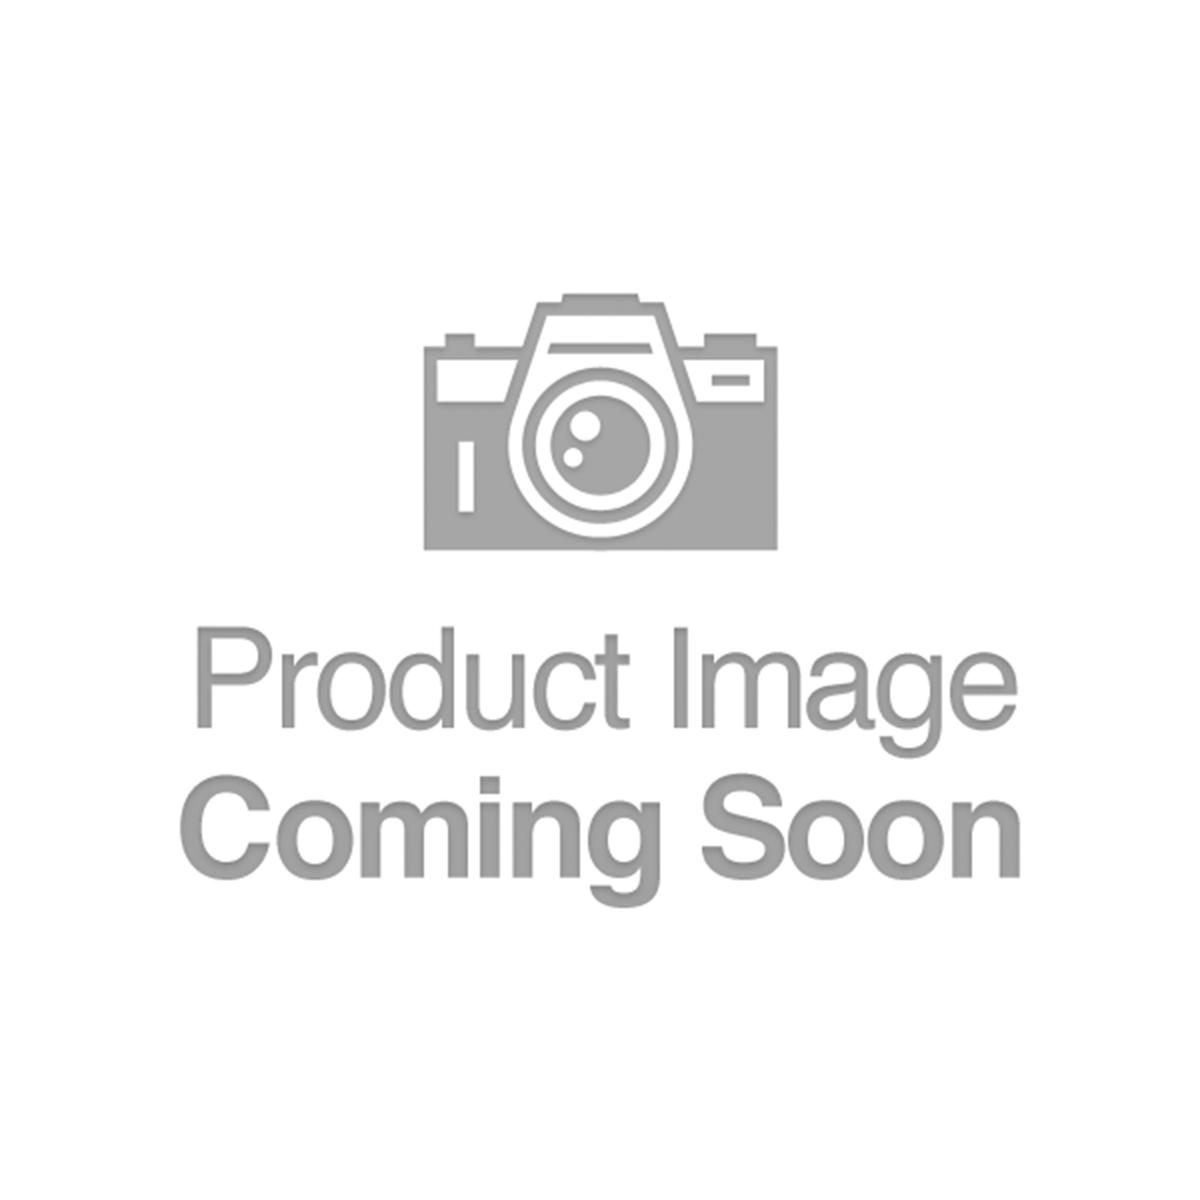 FR. 1180 $20 1905 Gold Certificate PMG 65 EPQ